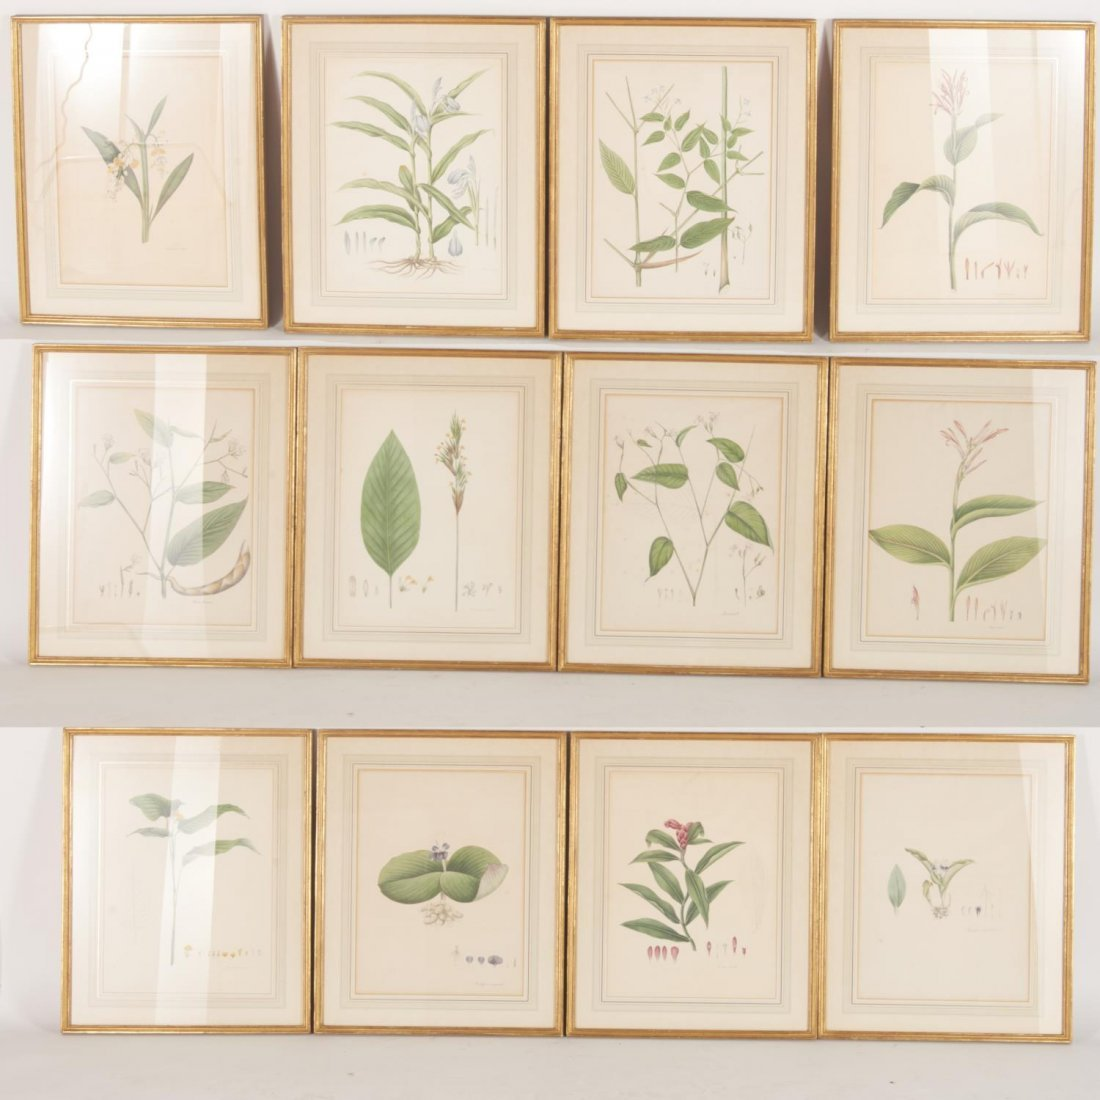 Set (12) antique French matted botanical prints